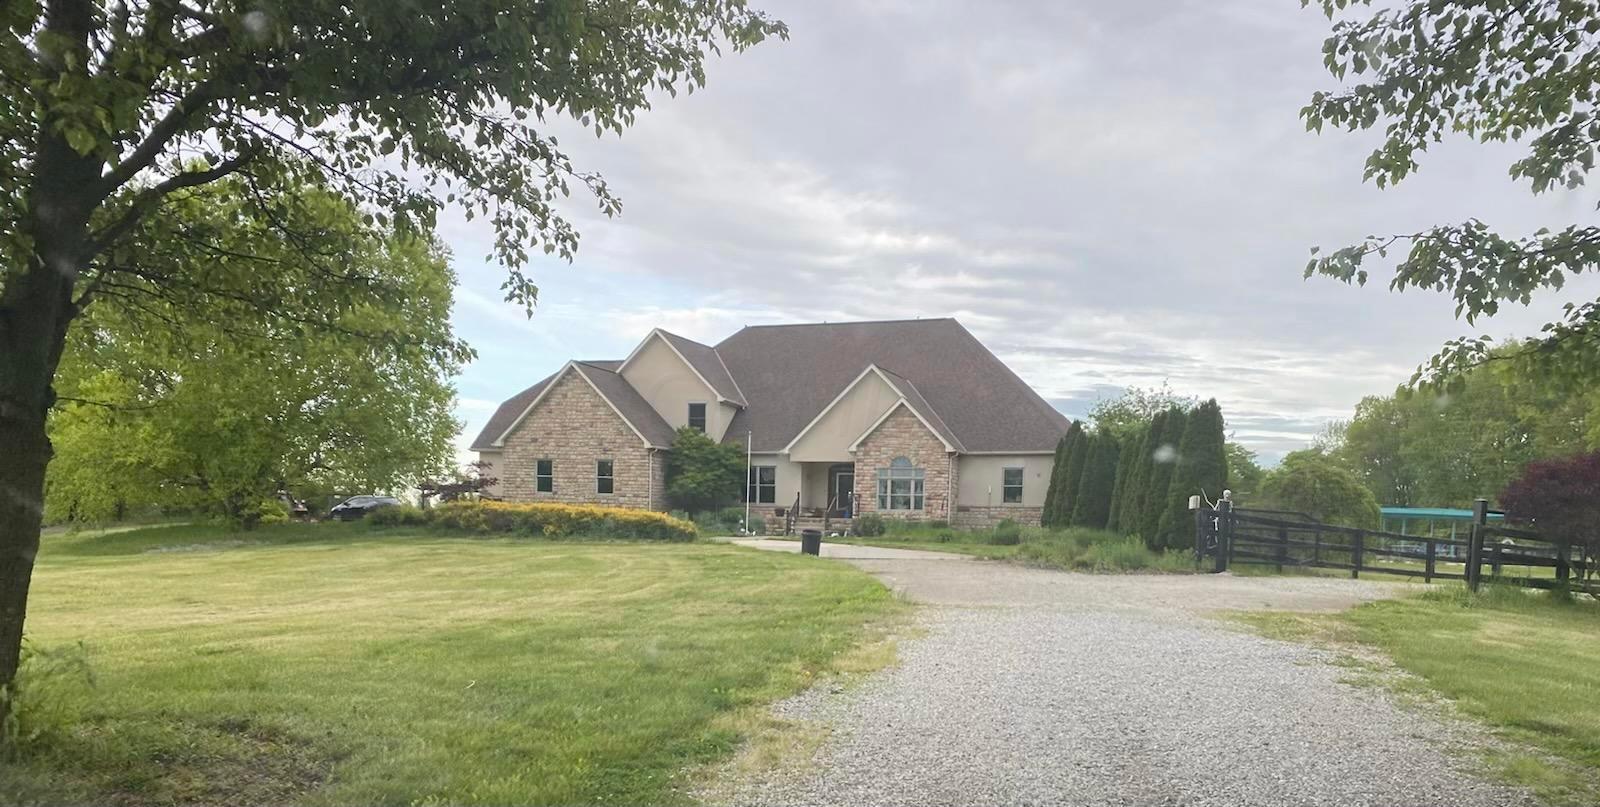 Photo of 10704 Lockbourne Eastern Road, Ashville, OH 43103